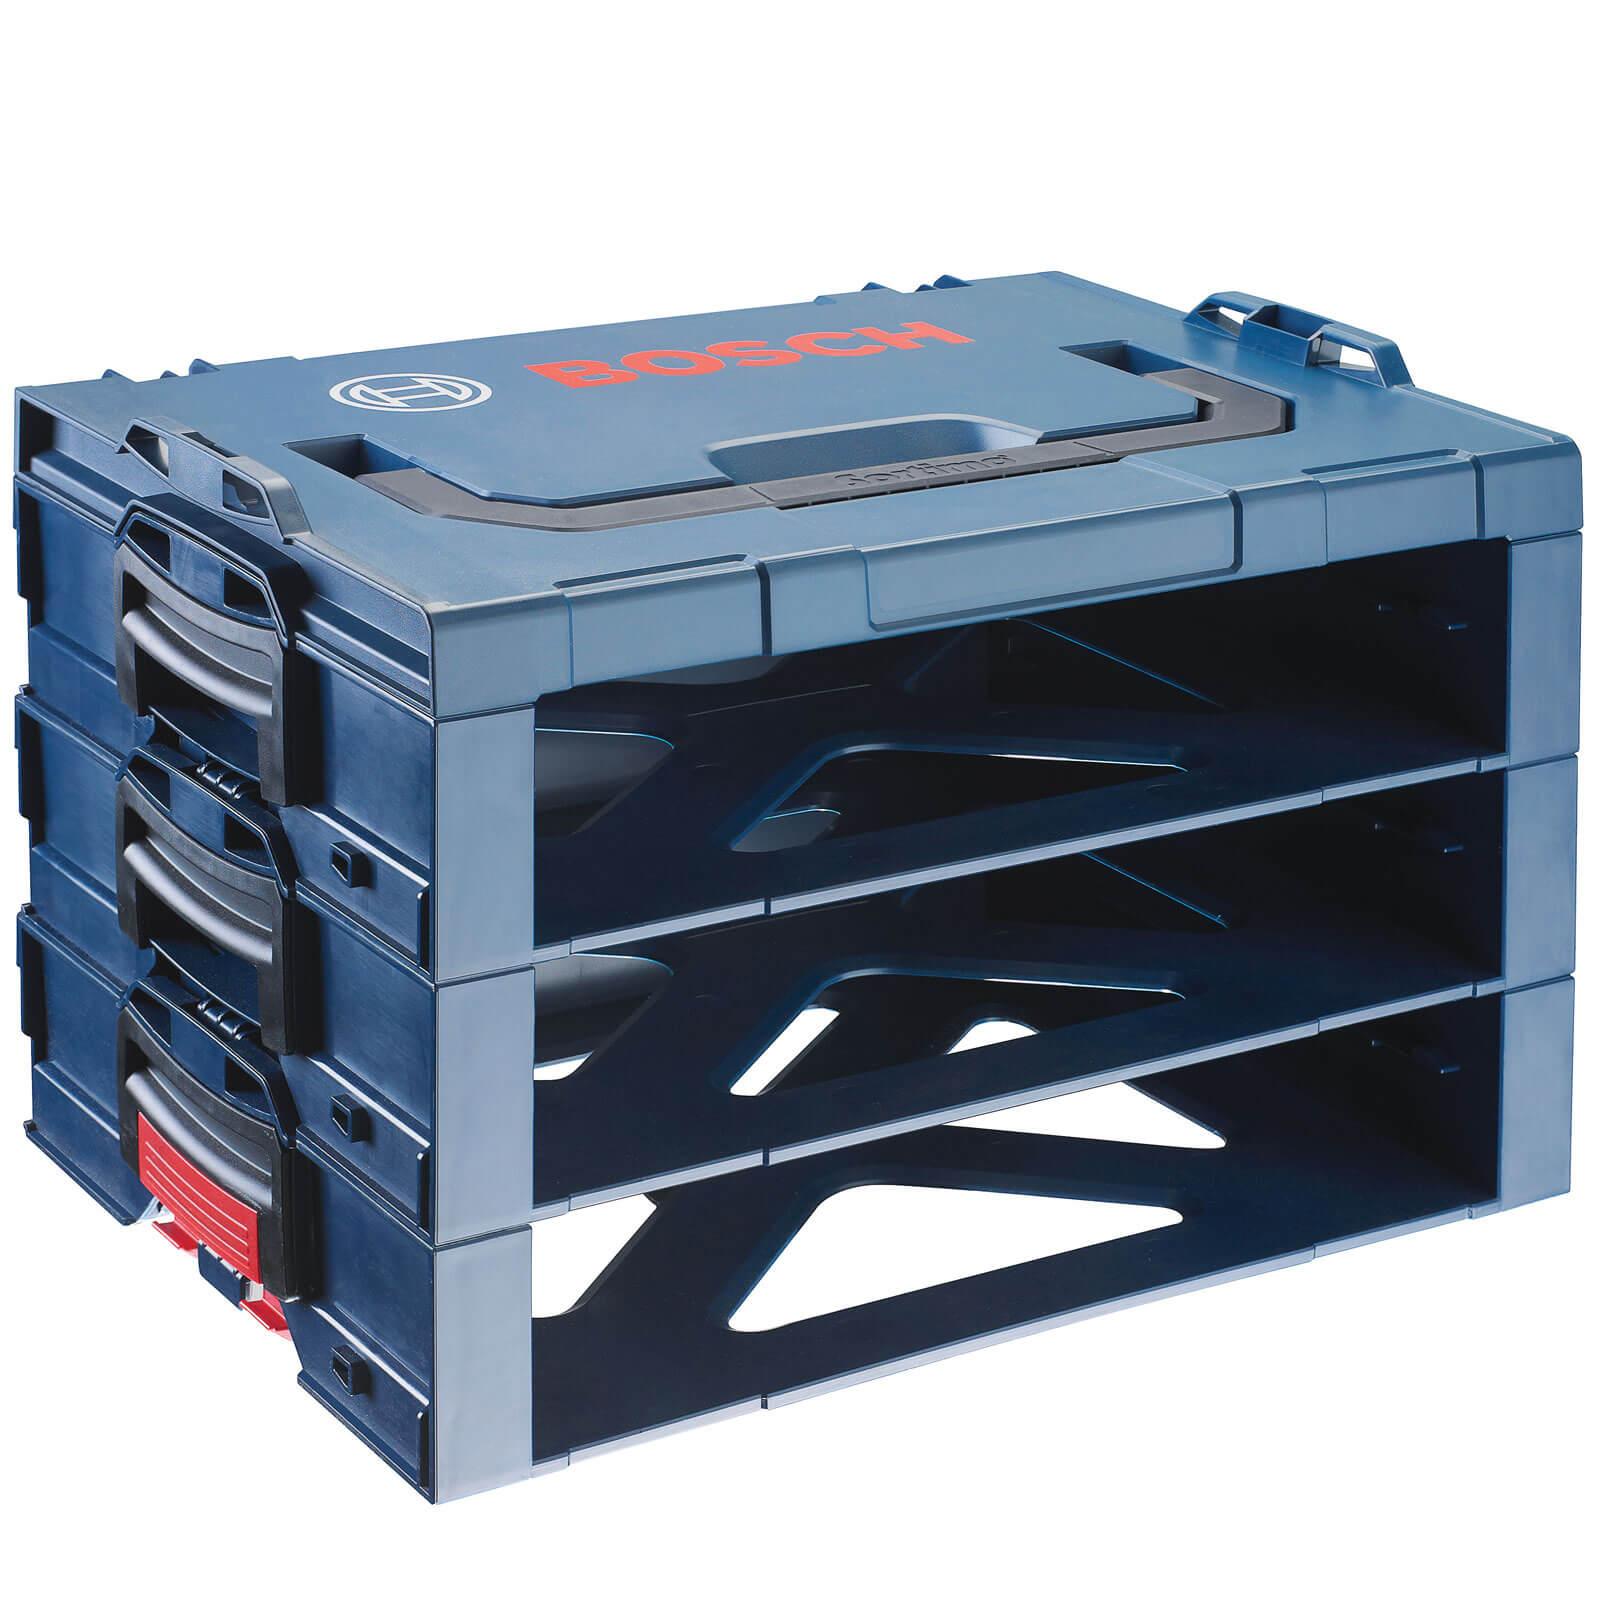 Image of Bosch i-BOXX 3 Bay Storage Case Mounting Systems